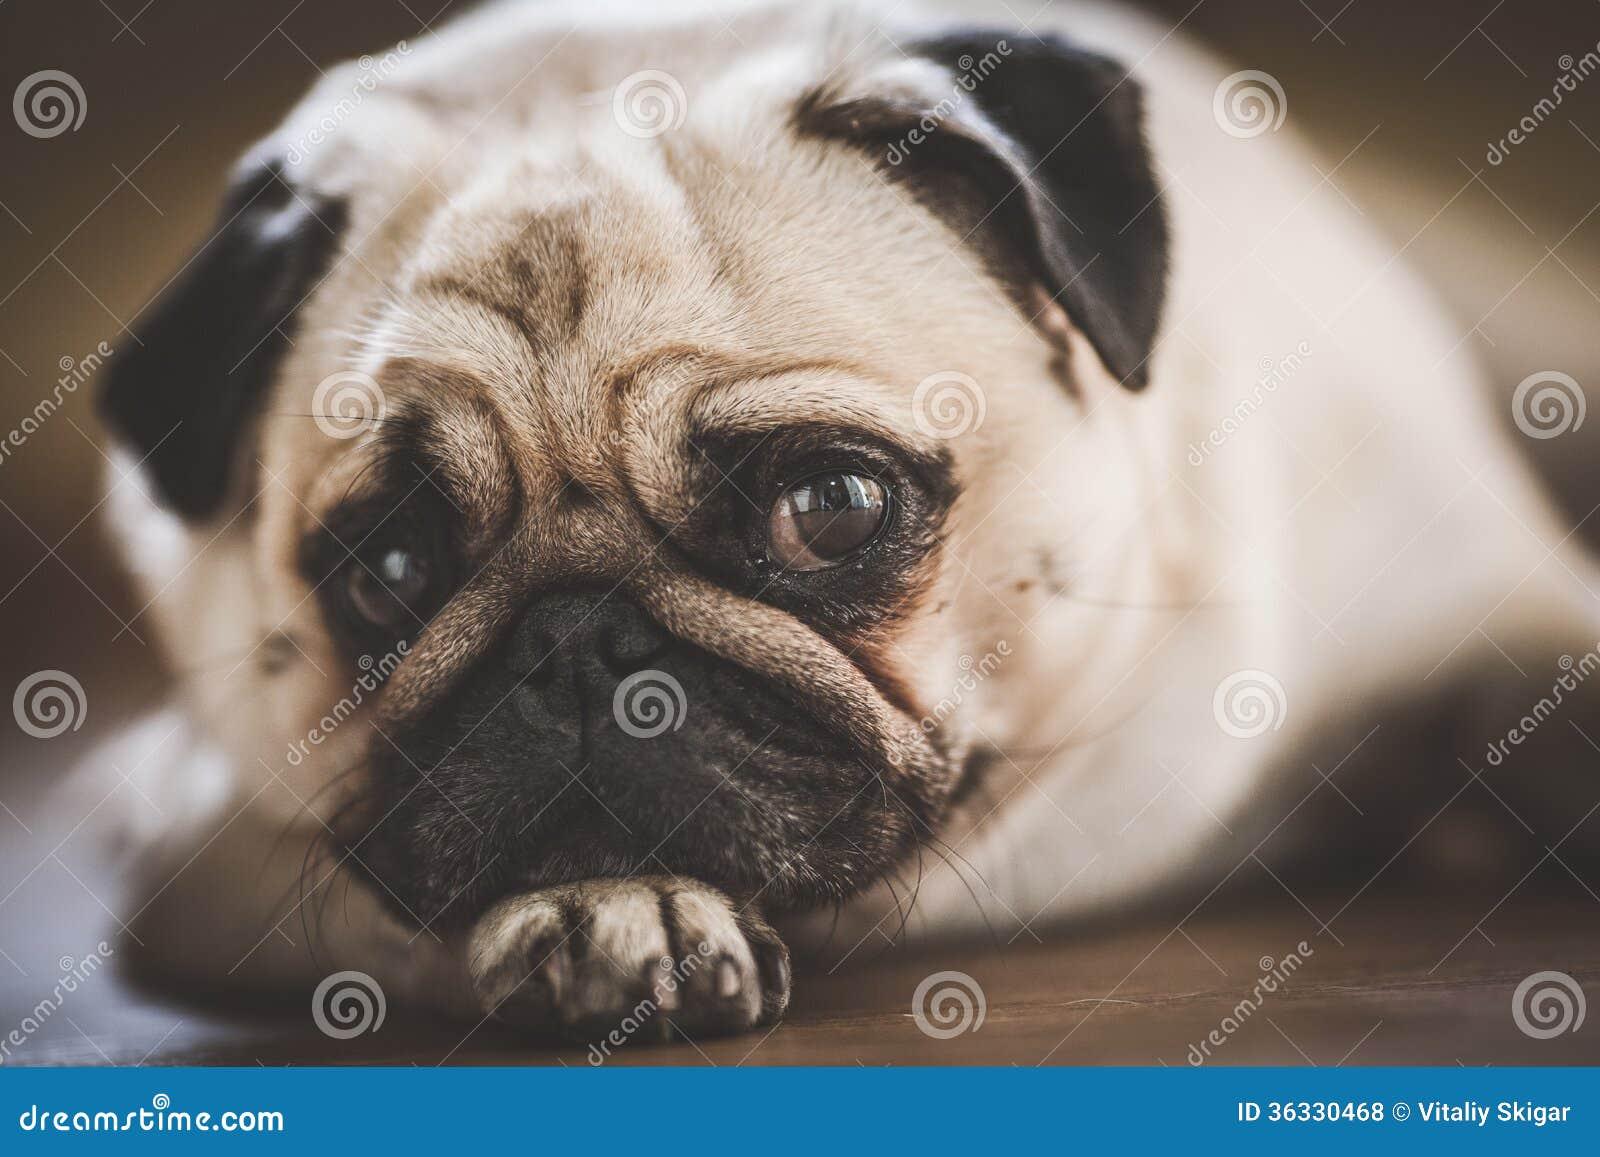 A cute Pug dog